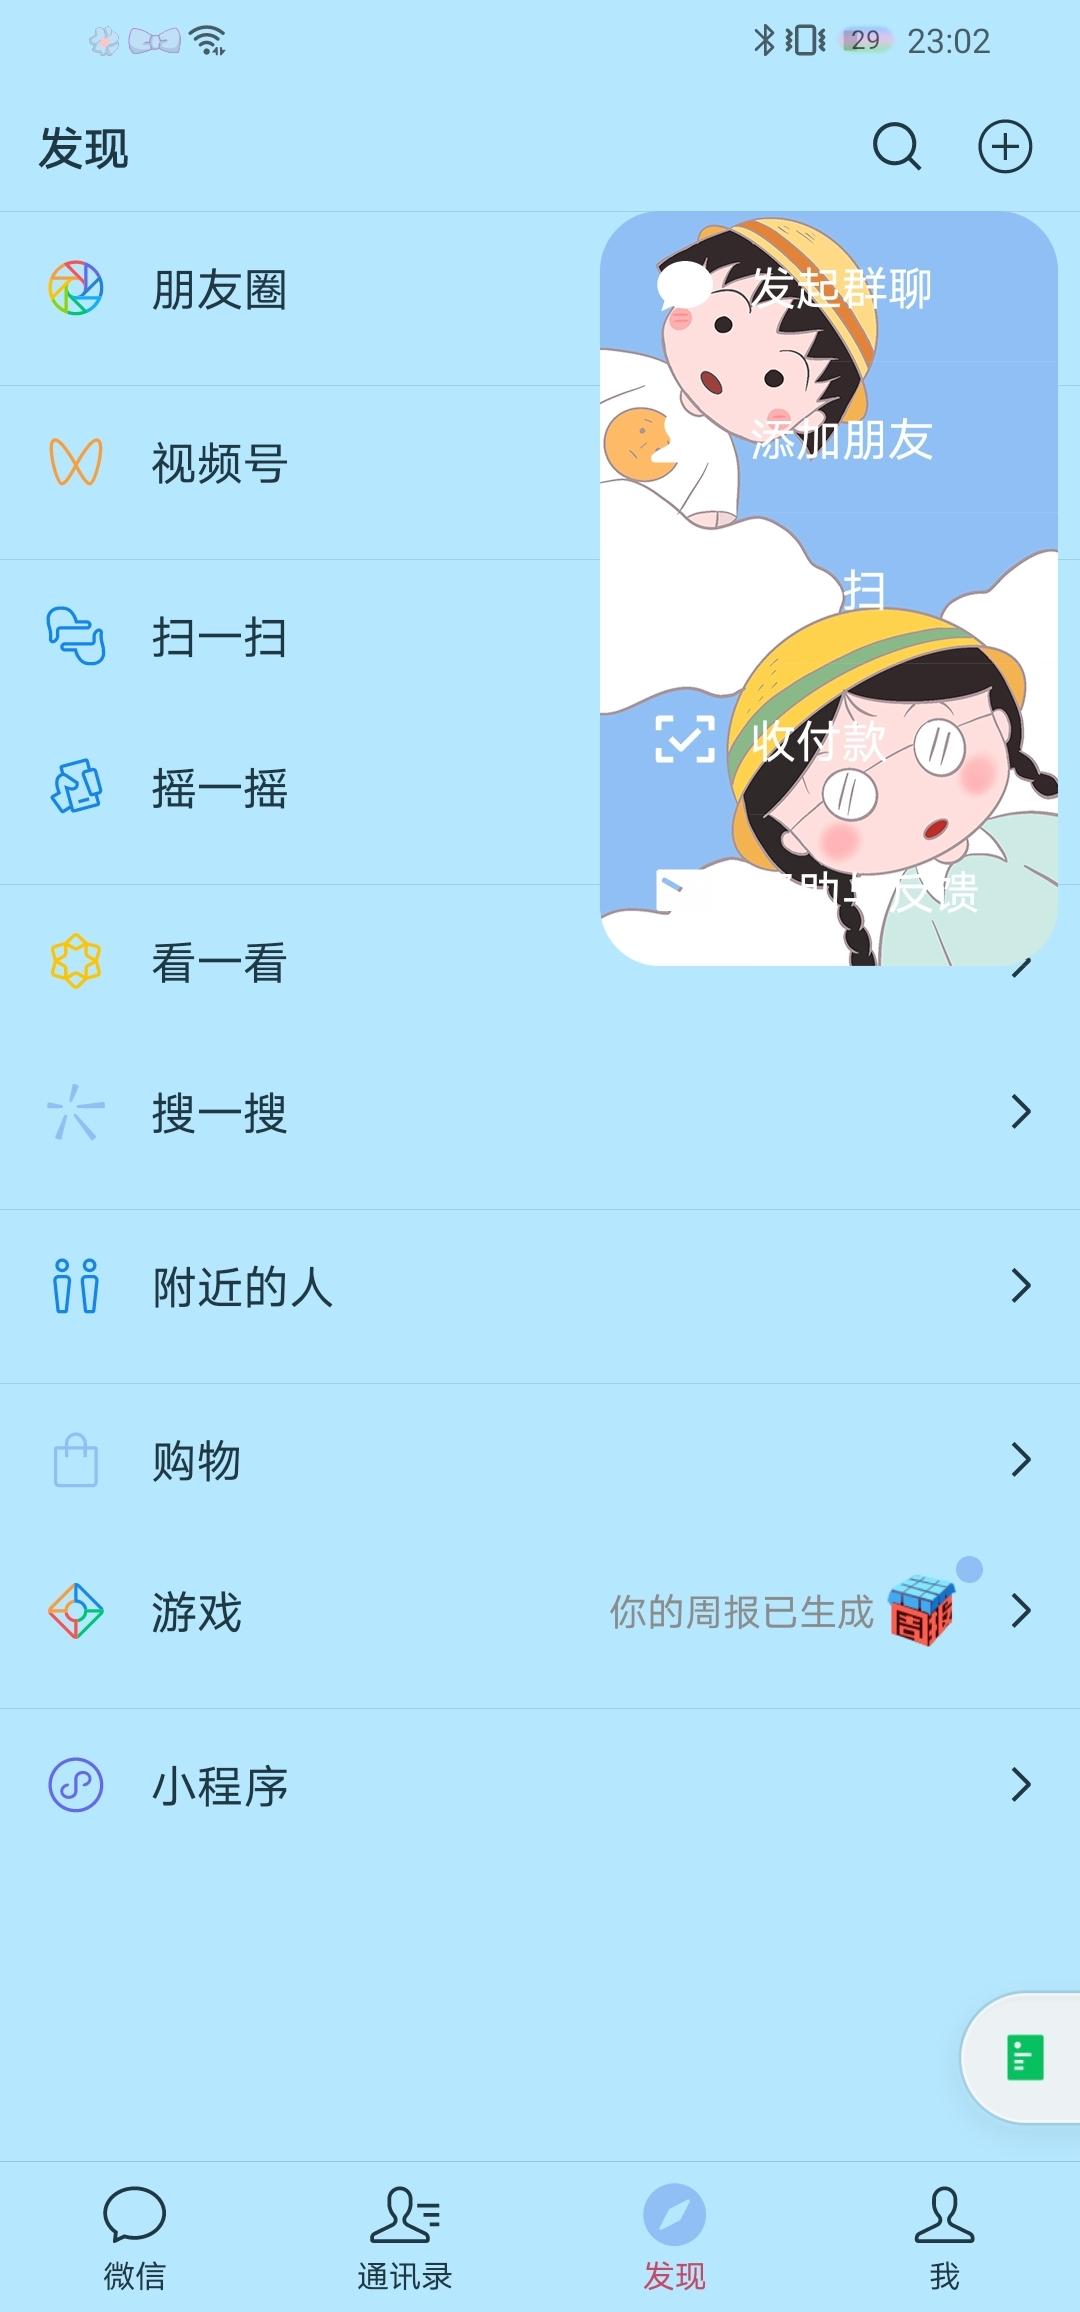 Screenshot_20201005_230206_com.tencent.mm.jpg